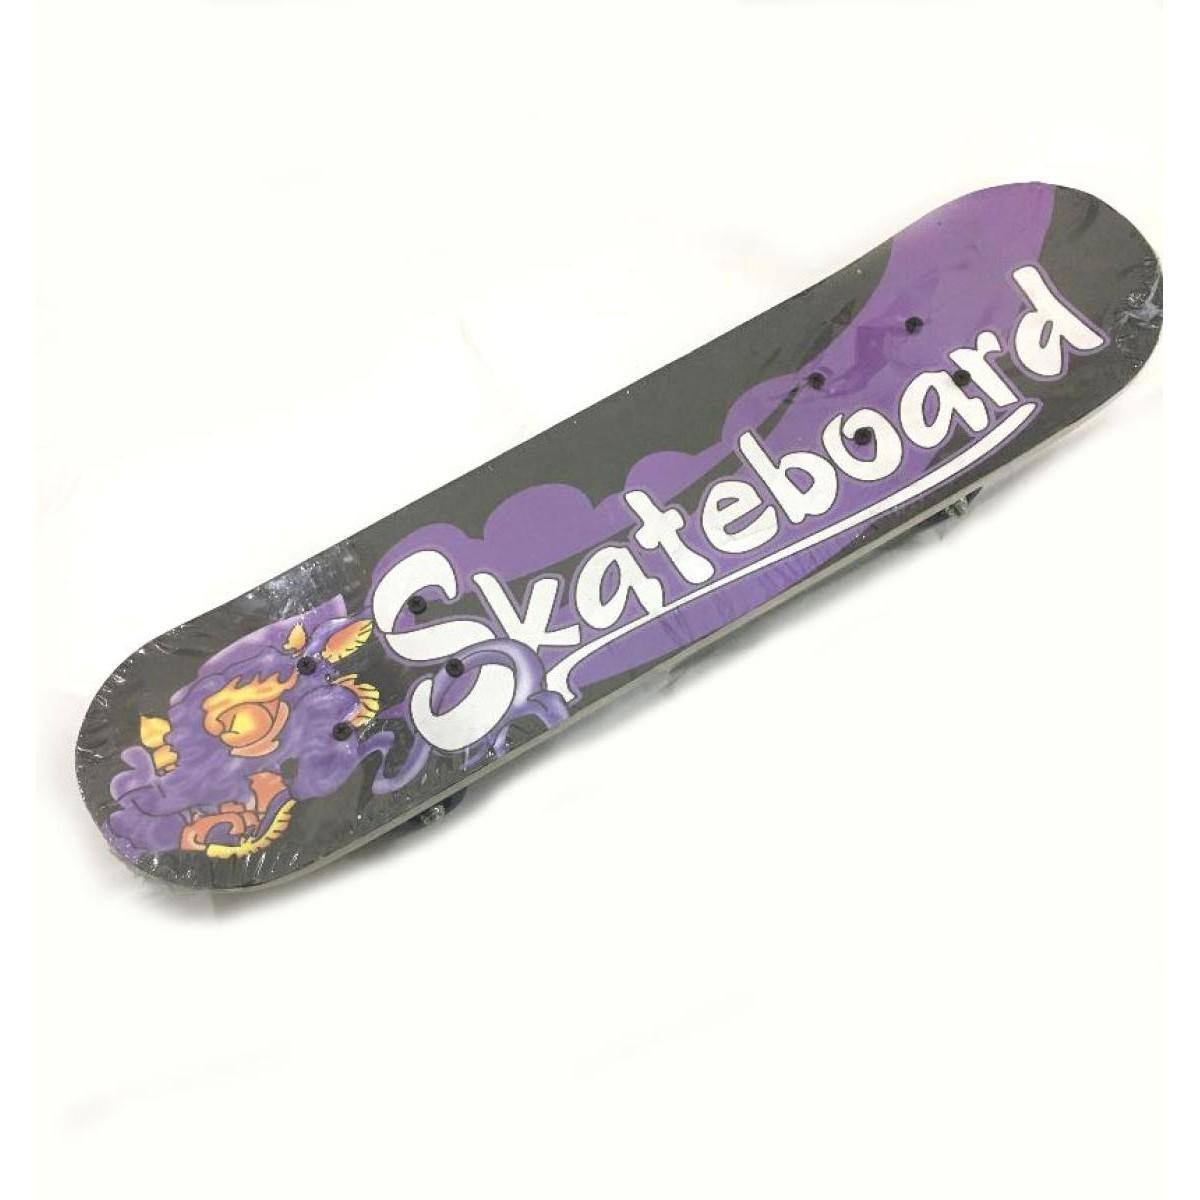 "Skateboard 23"" Medium Wood for Teens Adults Beginners Girls Boys Kids (random design)"